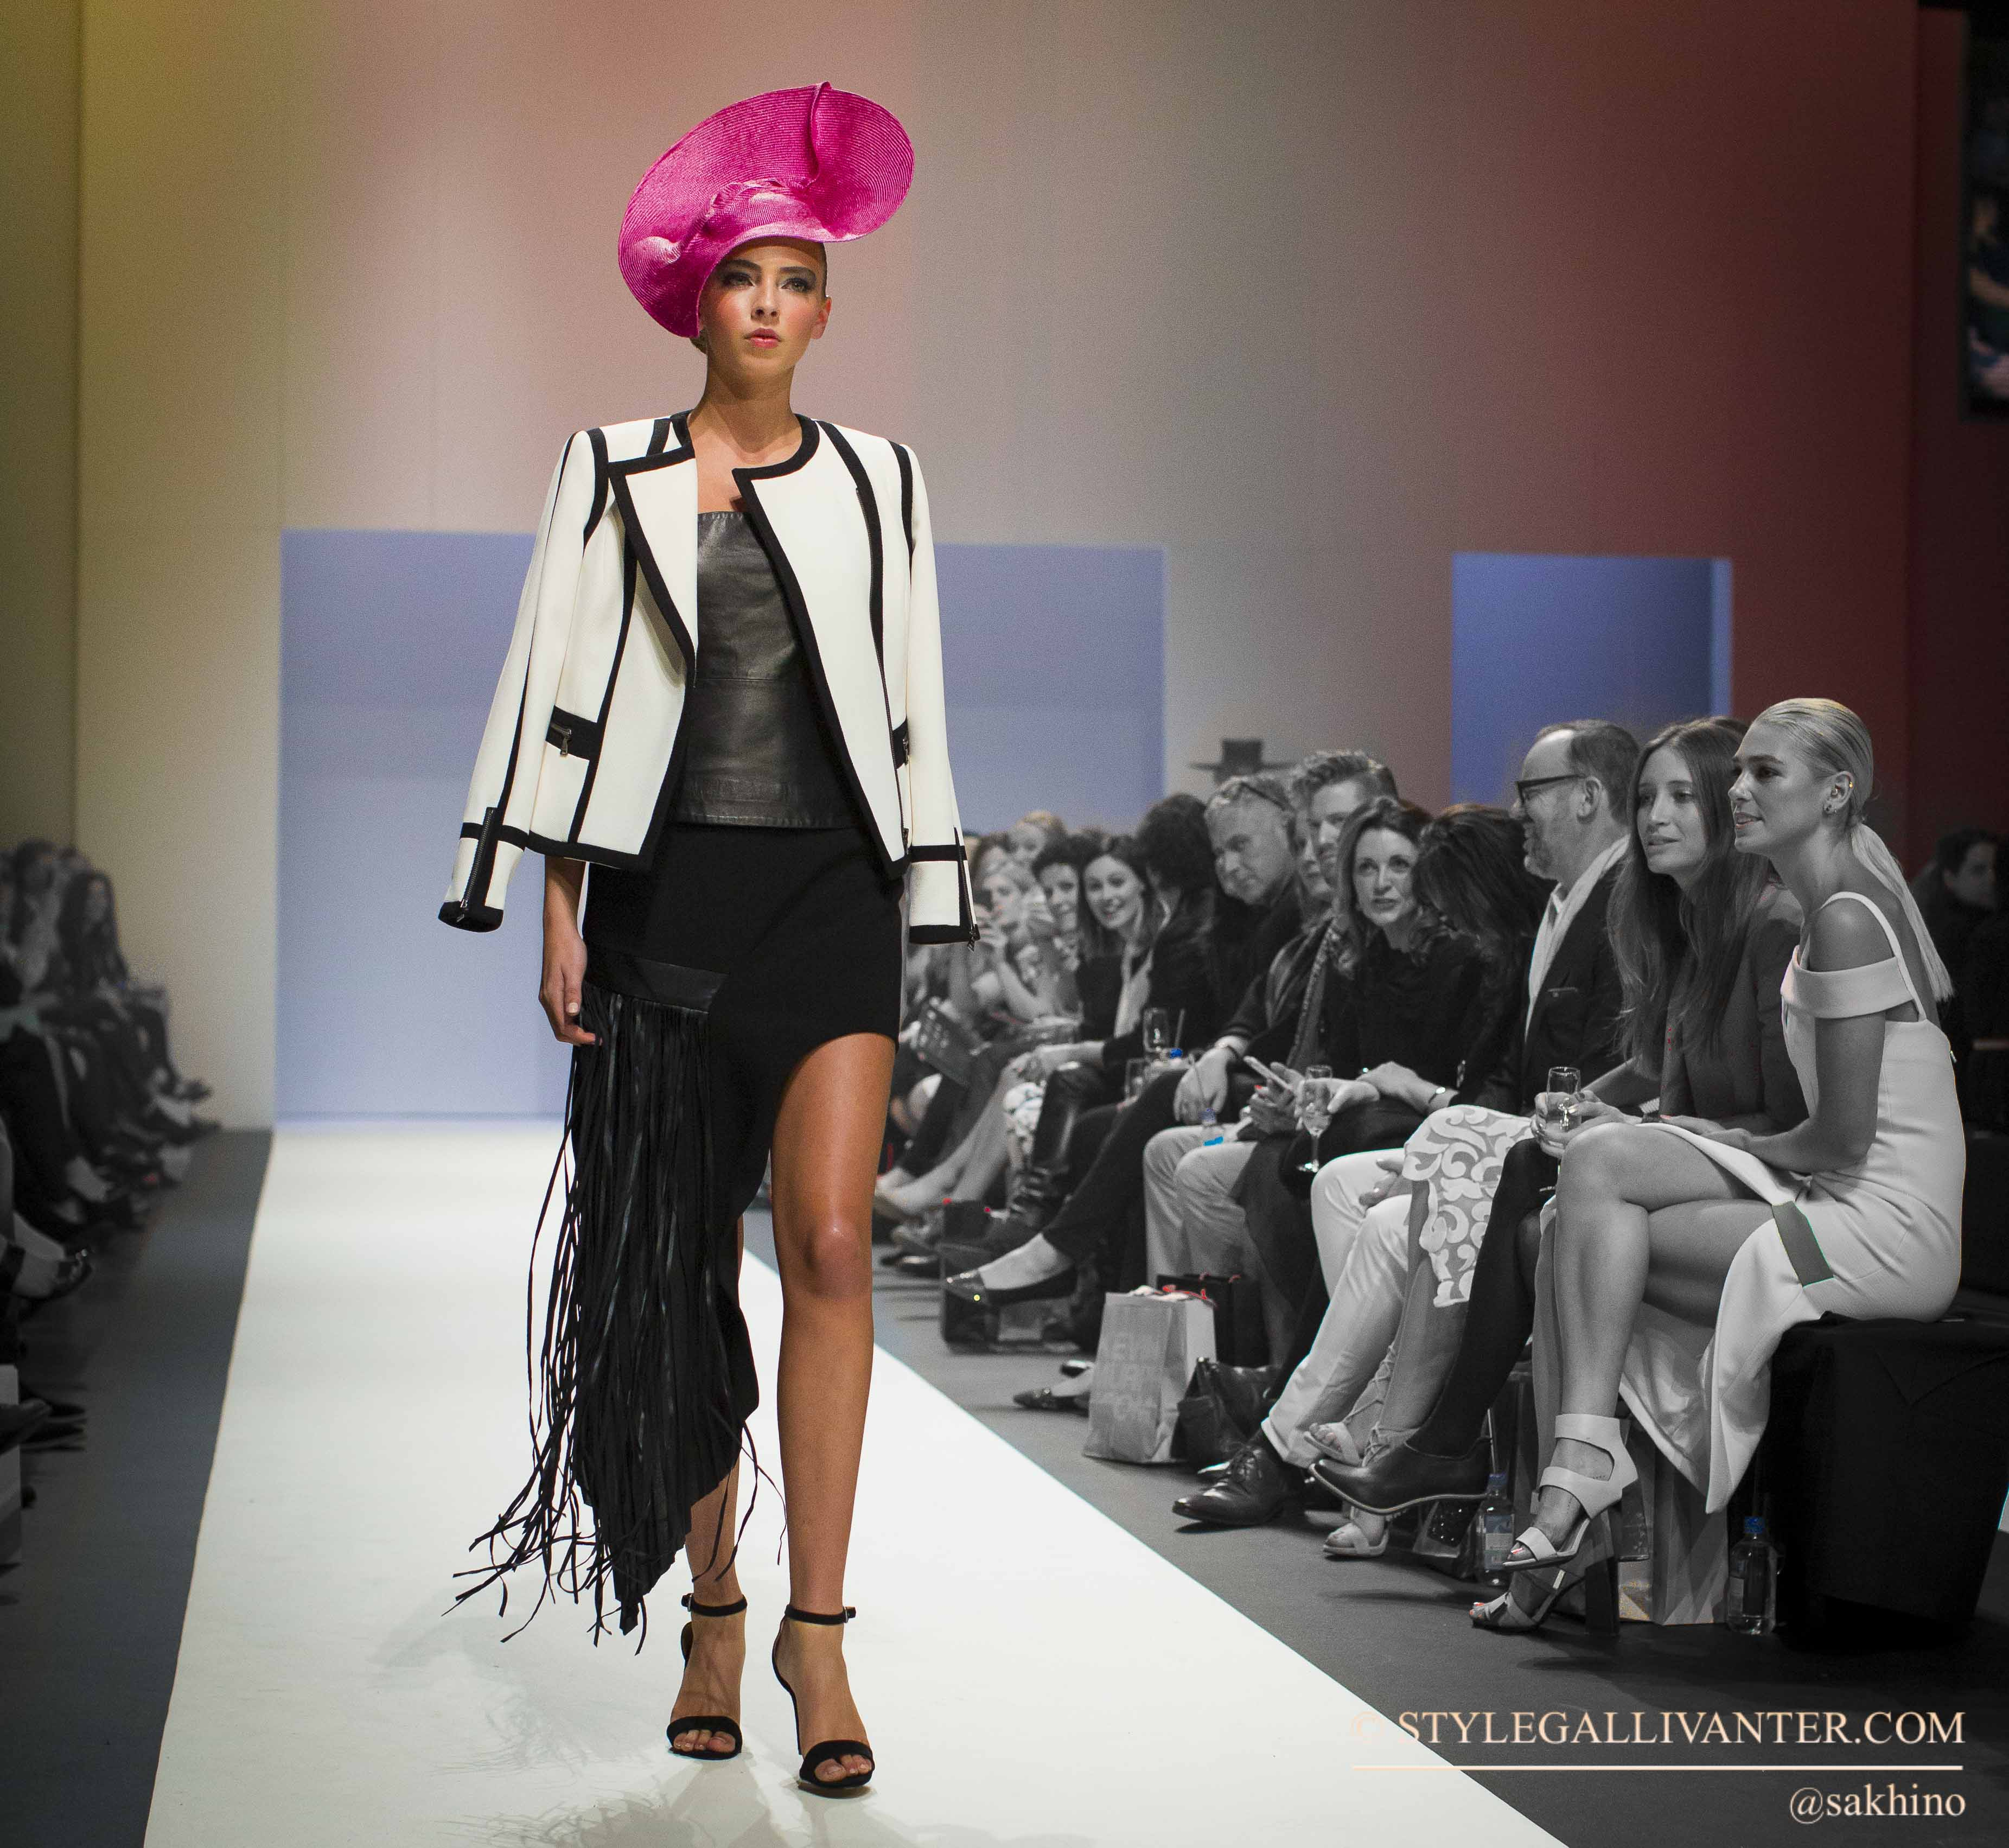 copyright-stylegallivanter.com, msfw15-carnival-7